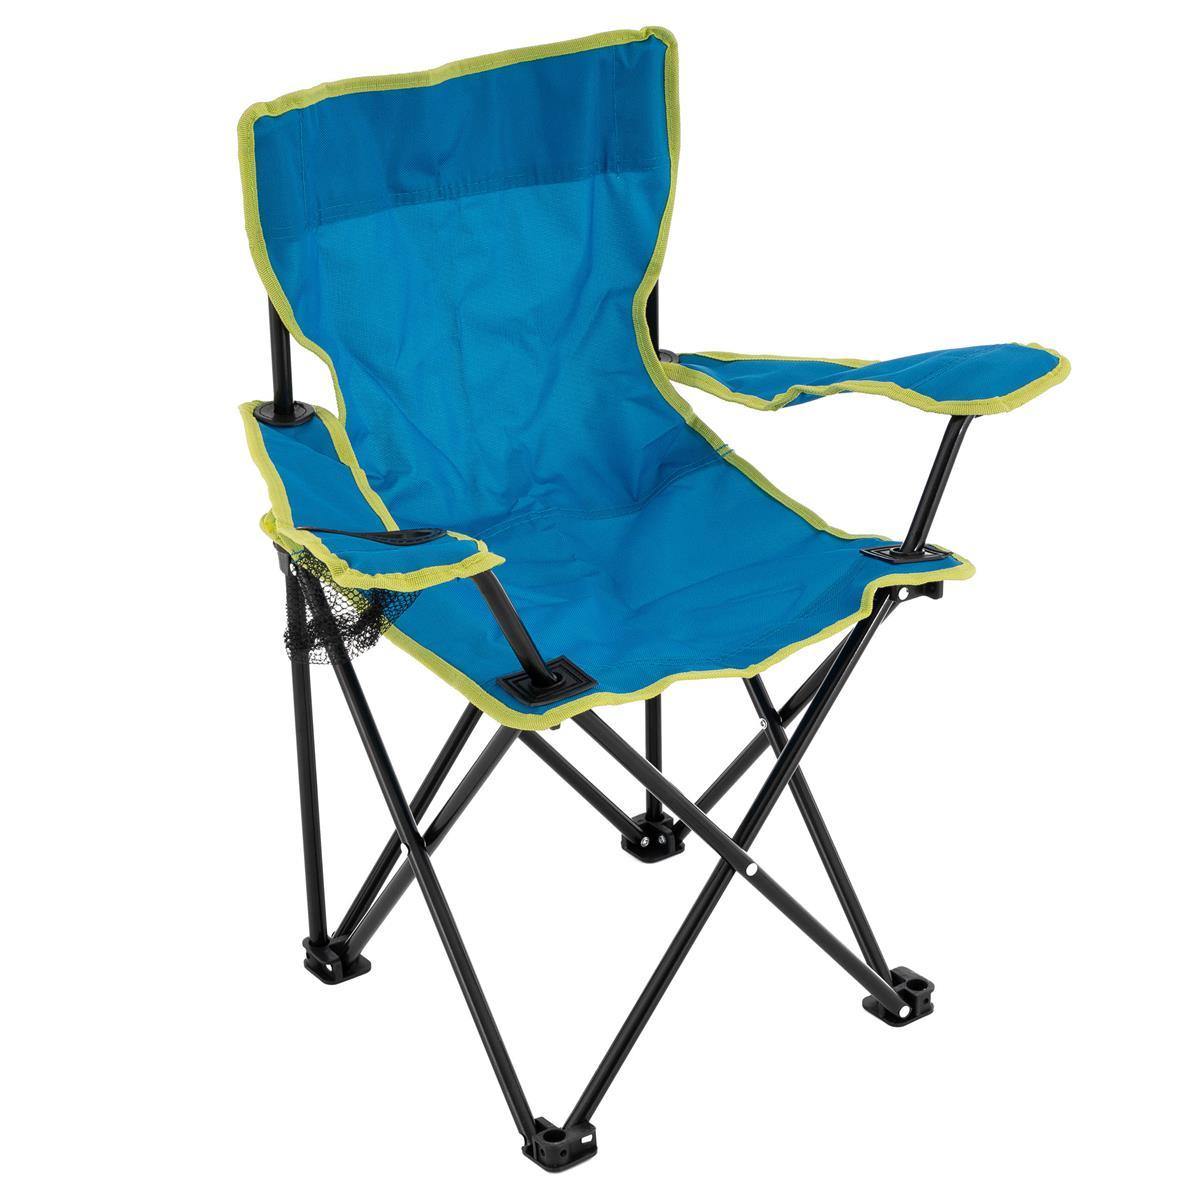 Kinder Campingstuhl Faltstuhl Angelstuhl mit Getränkehalter Tasche stabil blau